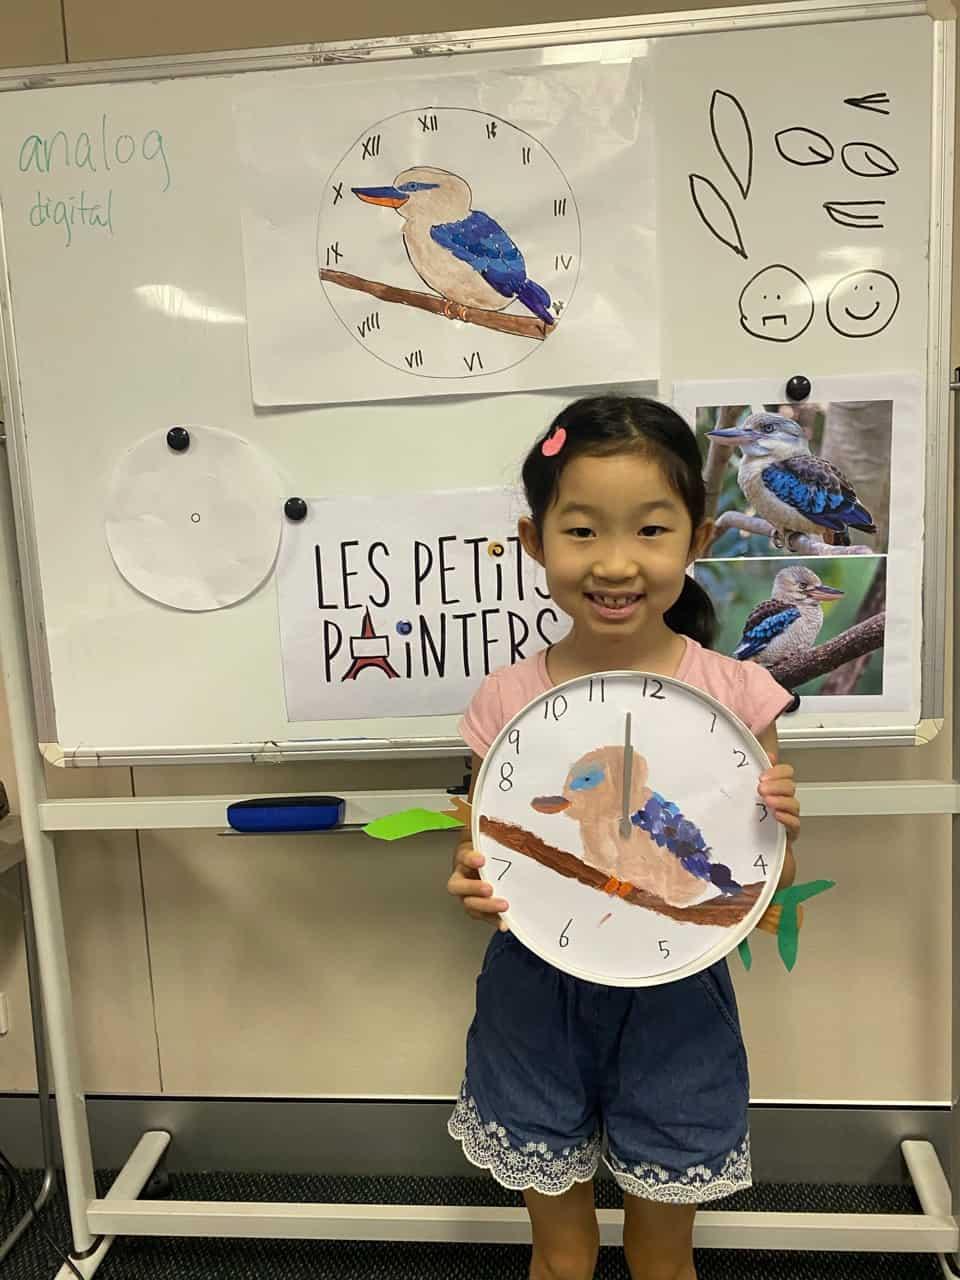 Les Petits Painters art activities for children, art classes during school holidays, Kookaburra clock painted by kids